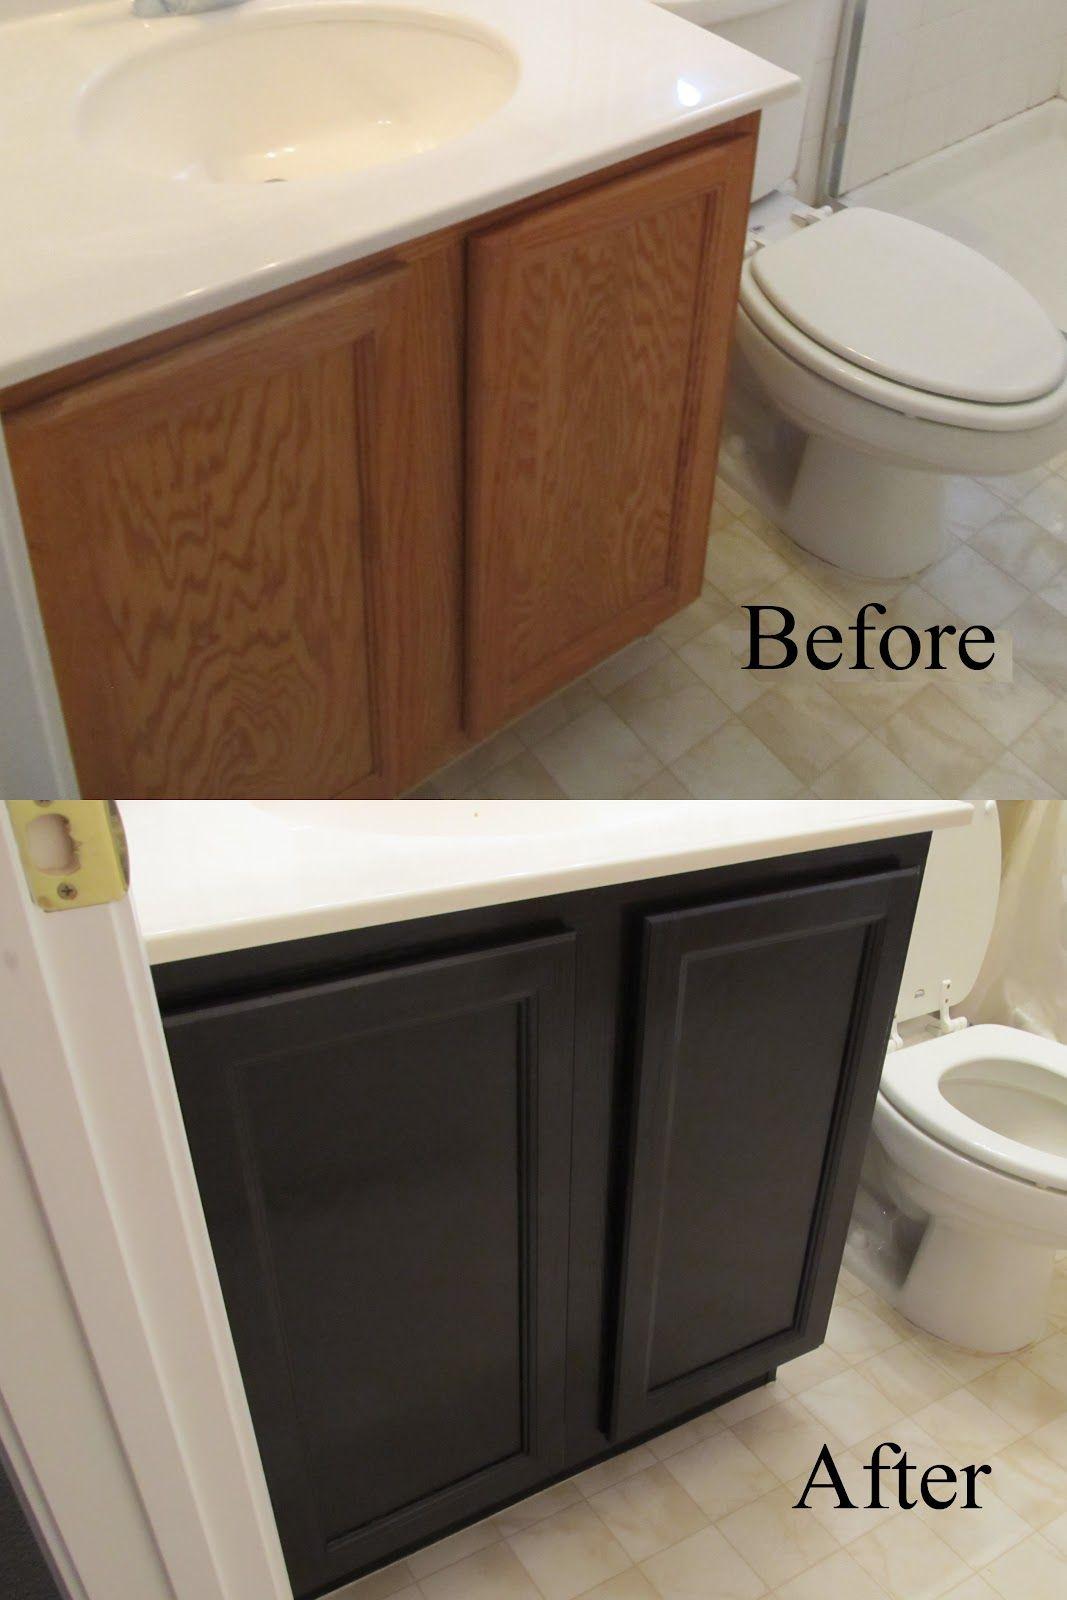 Staining Oak Cabinets An Espresso Color Diy Tutorial Staining Oak Cabinets Home Remodeling Diy Home Improvement